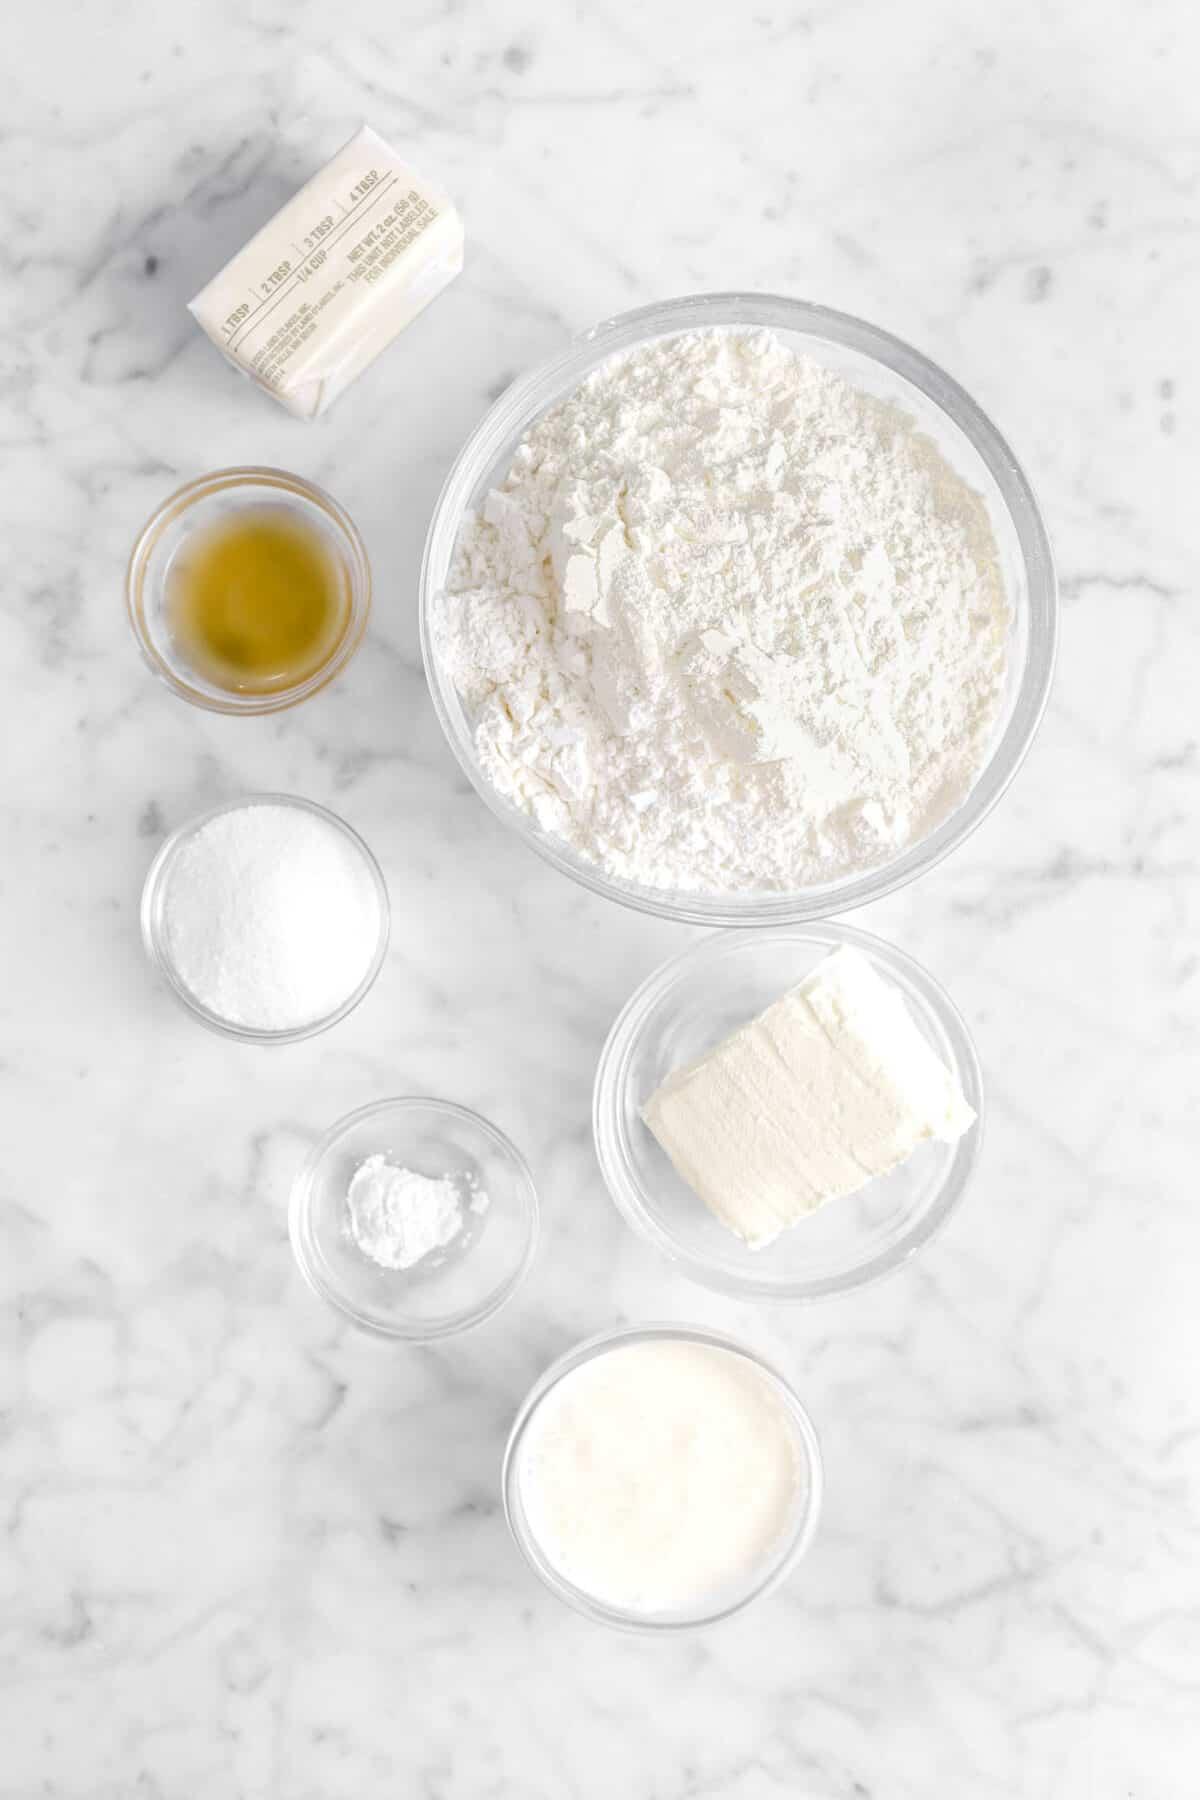 butter, apple cider vinegar, flour, sugar, baking powder, cream cheese, and heavy cream in glass bowls